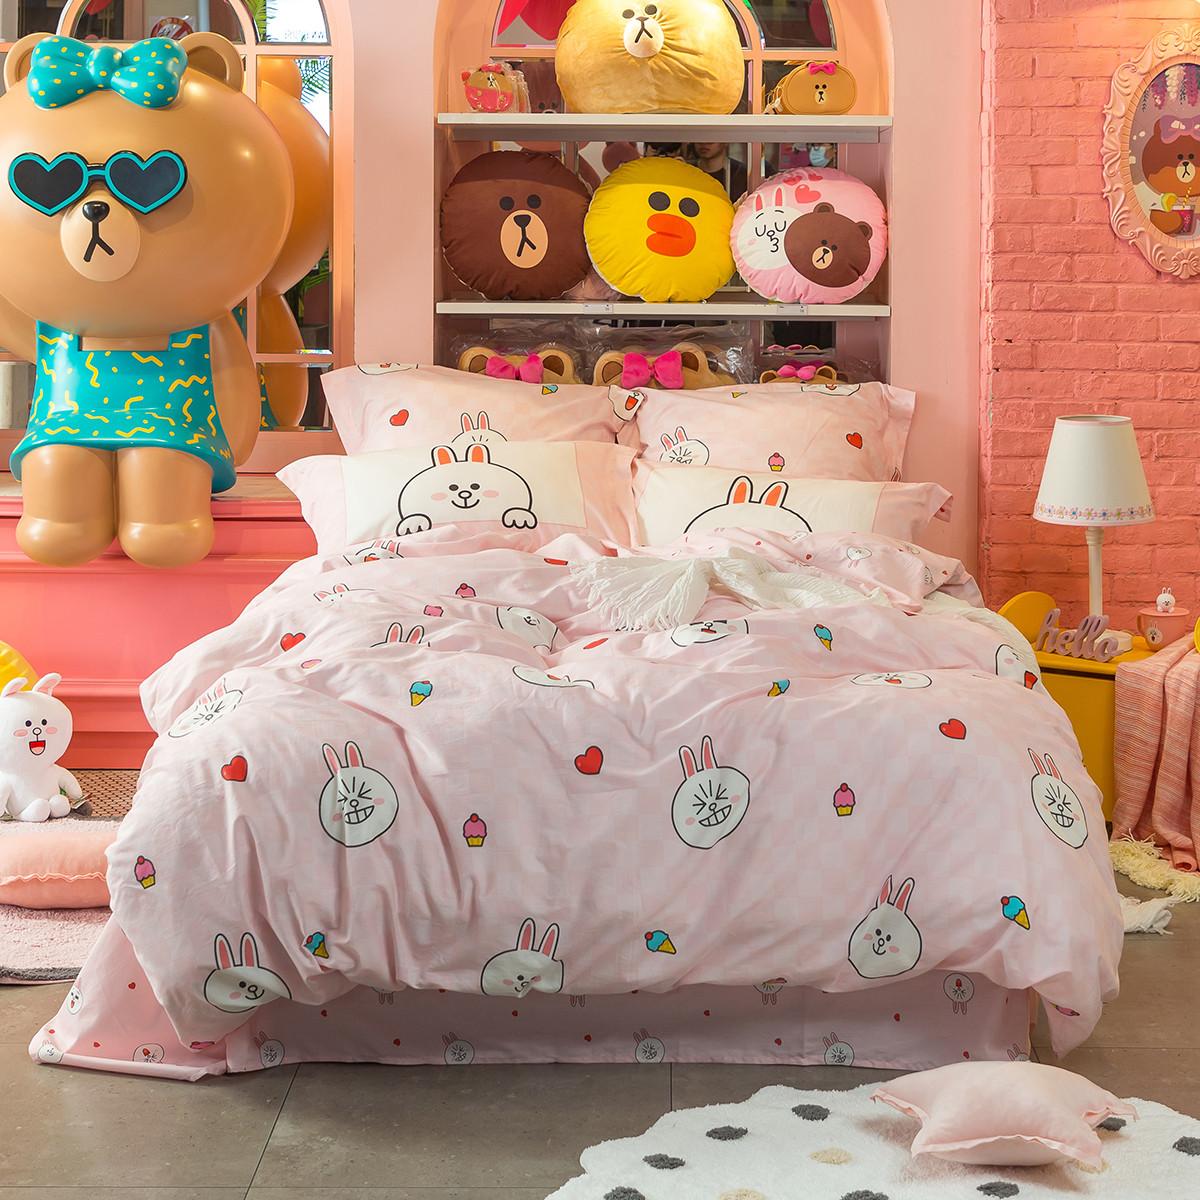 Dohia 多喜爱 布朗熊系列 甜甜可妮 40支全棉三件套 1.2m